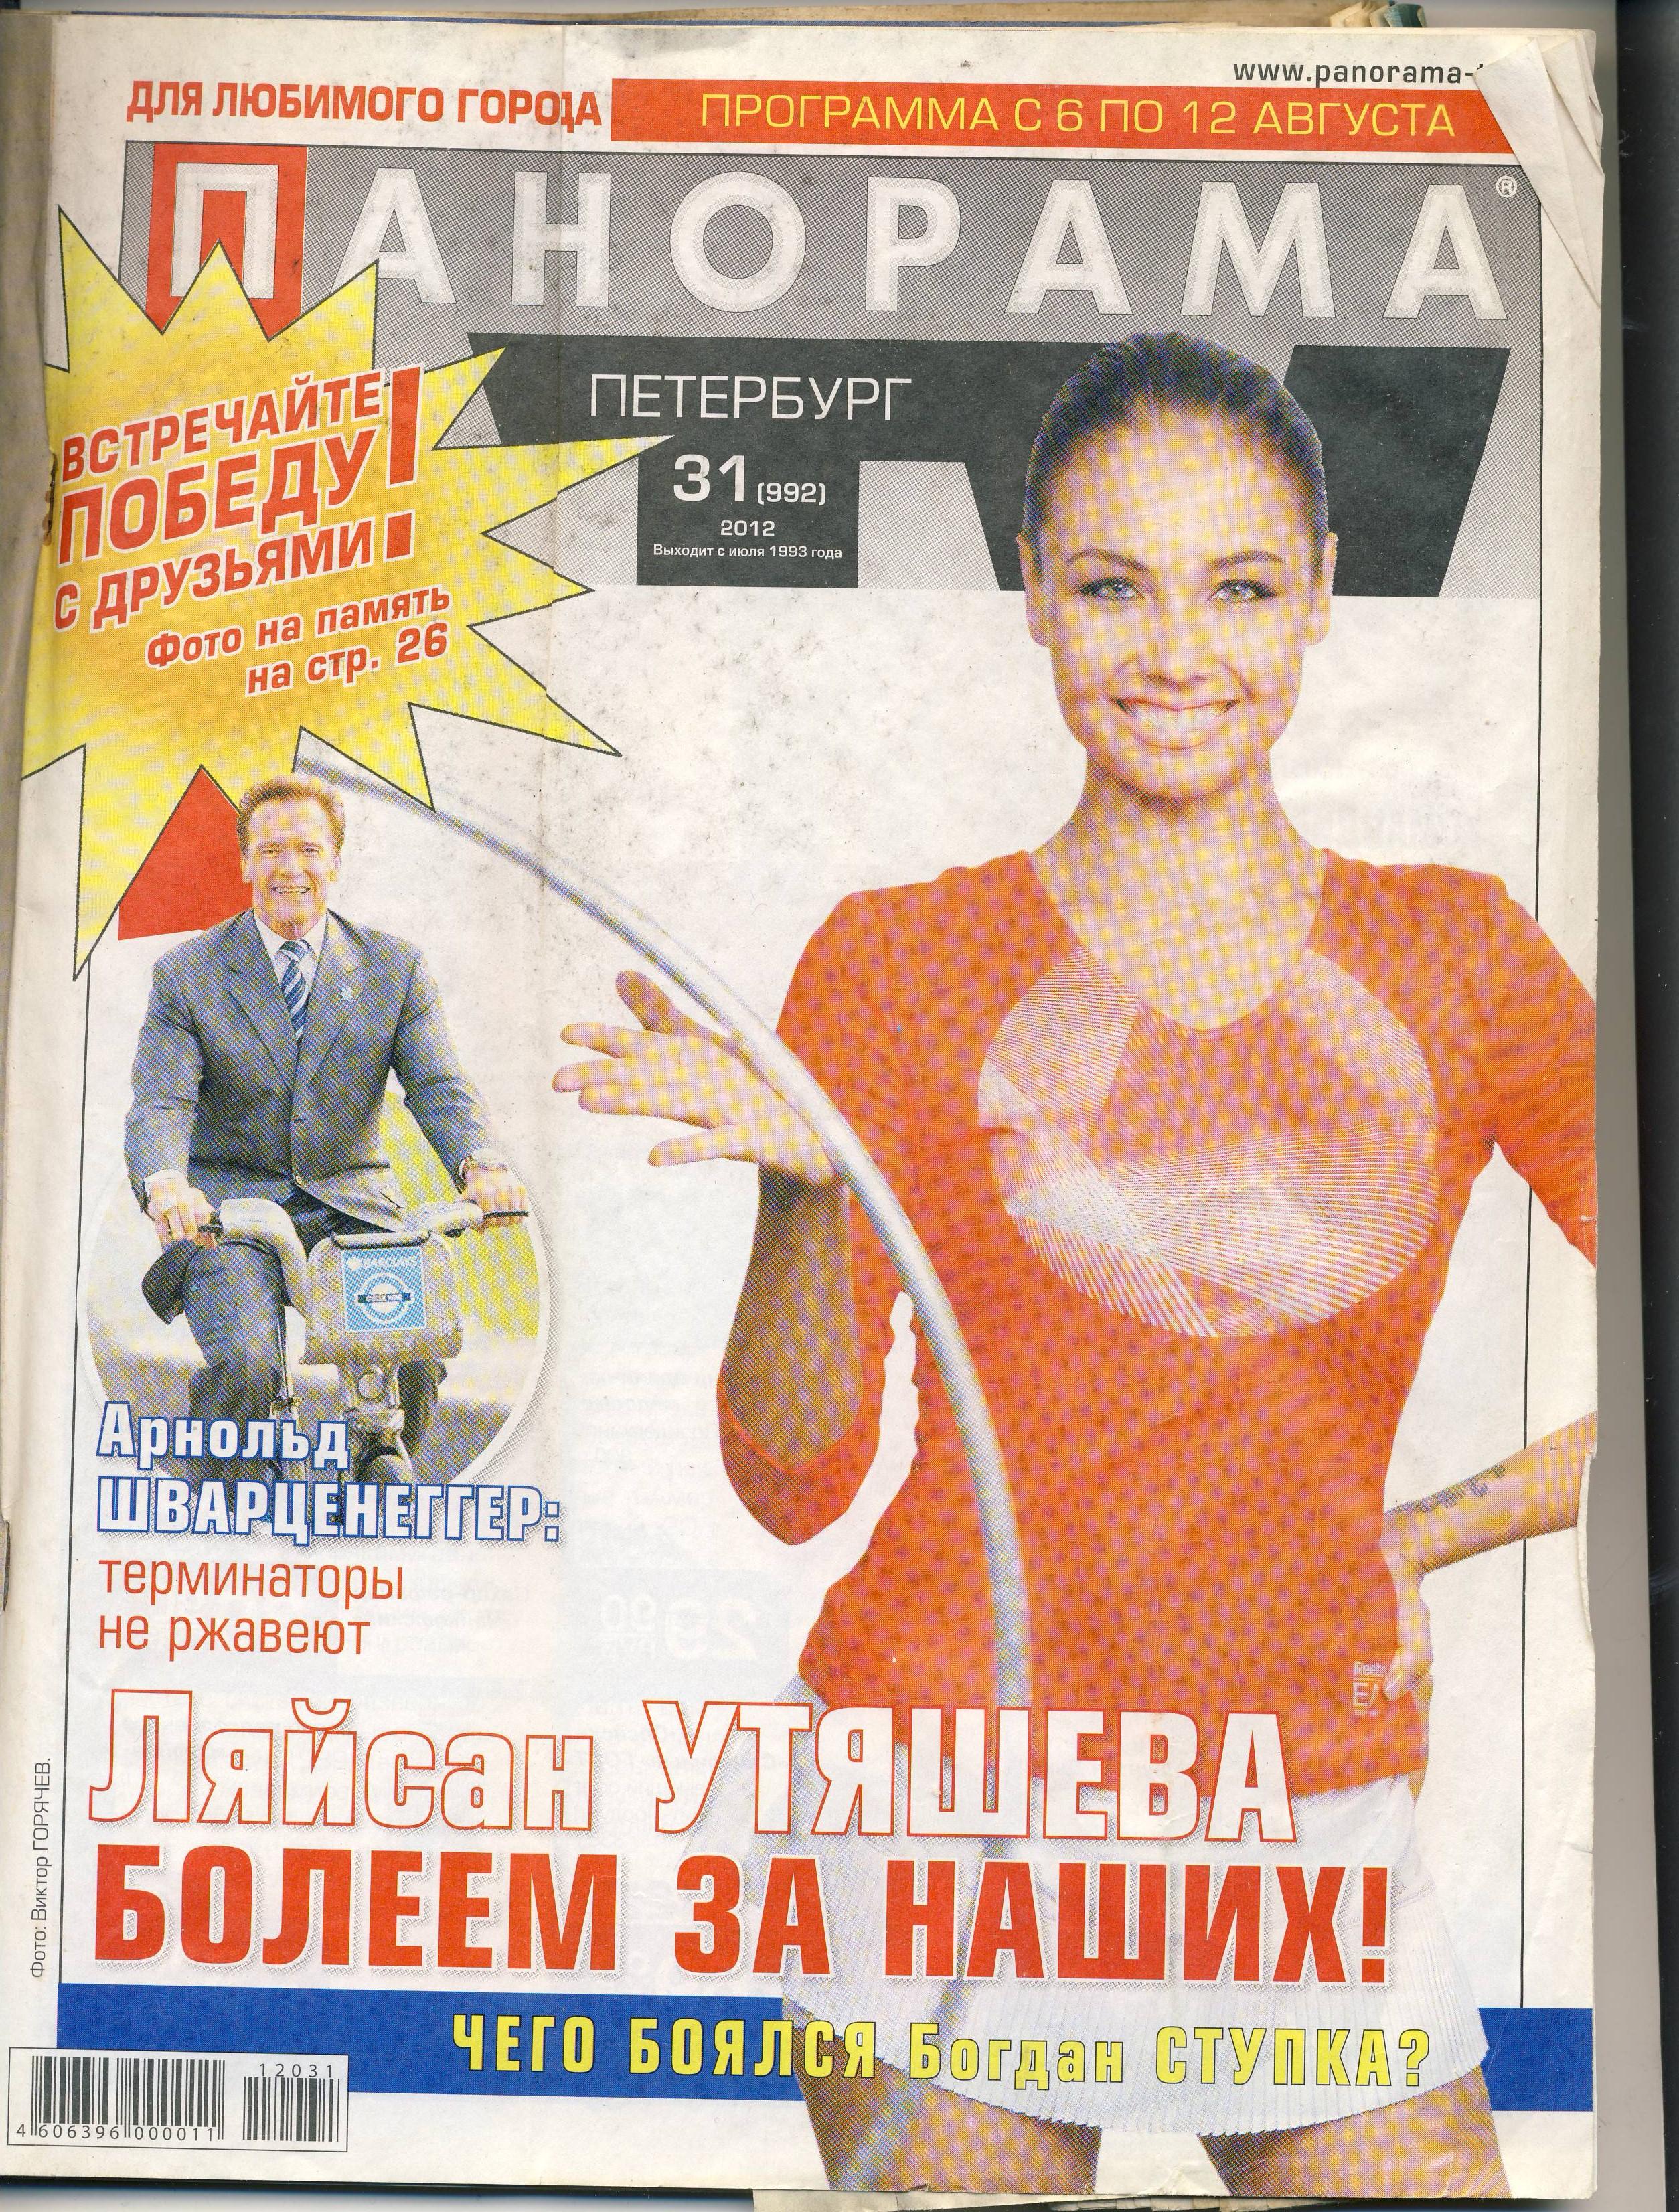 http://s7.uploads.ru/fvm7l.jpg